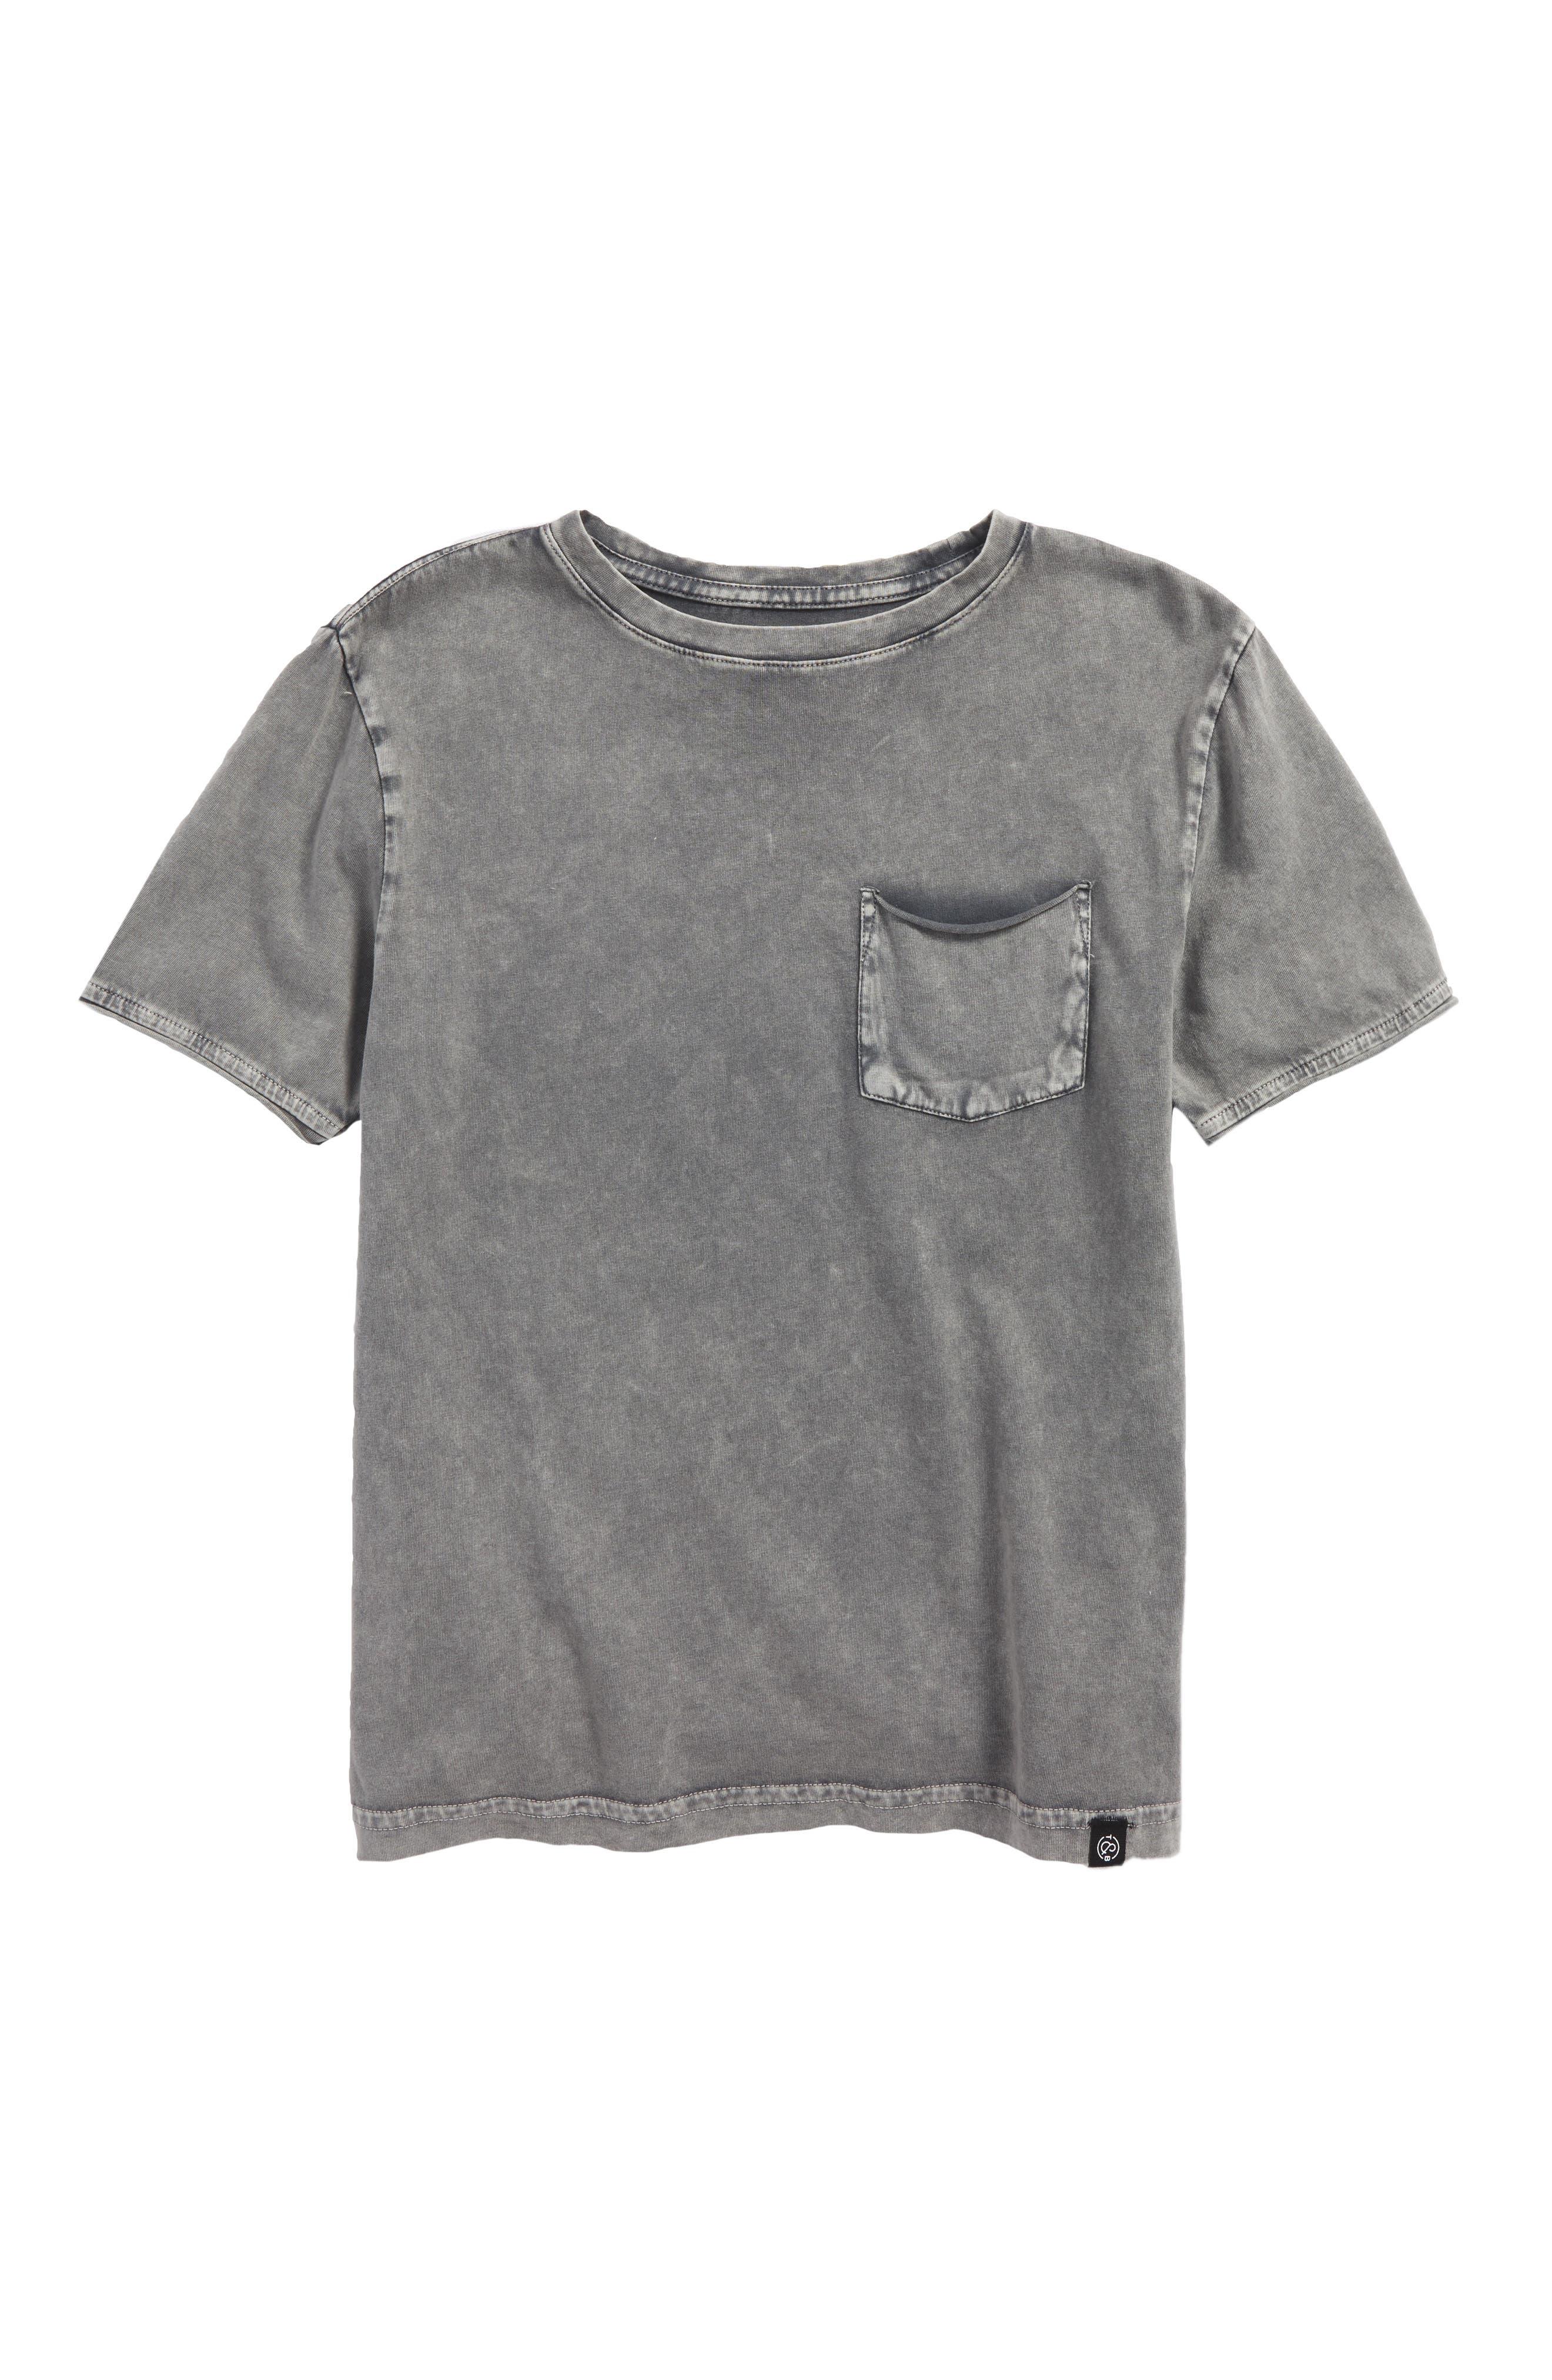 Main Image - Treasure & Bond Washed Pocket T-Shirt (Big Boys)